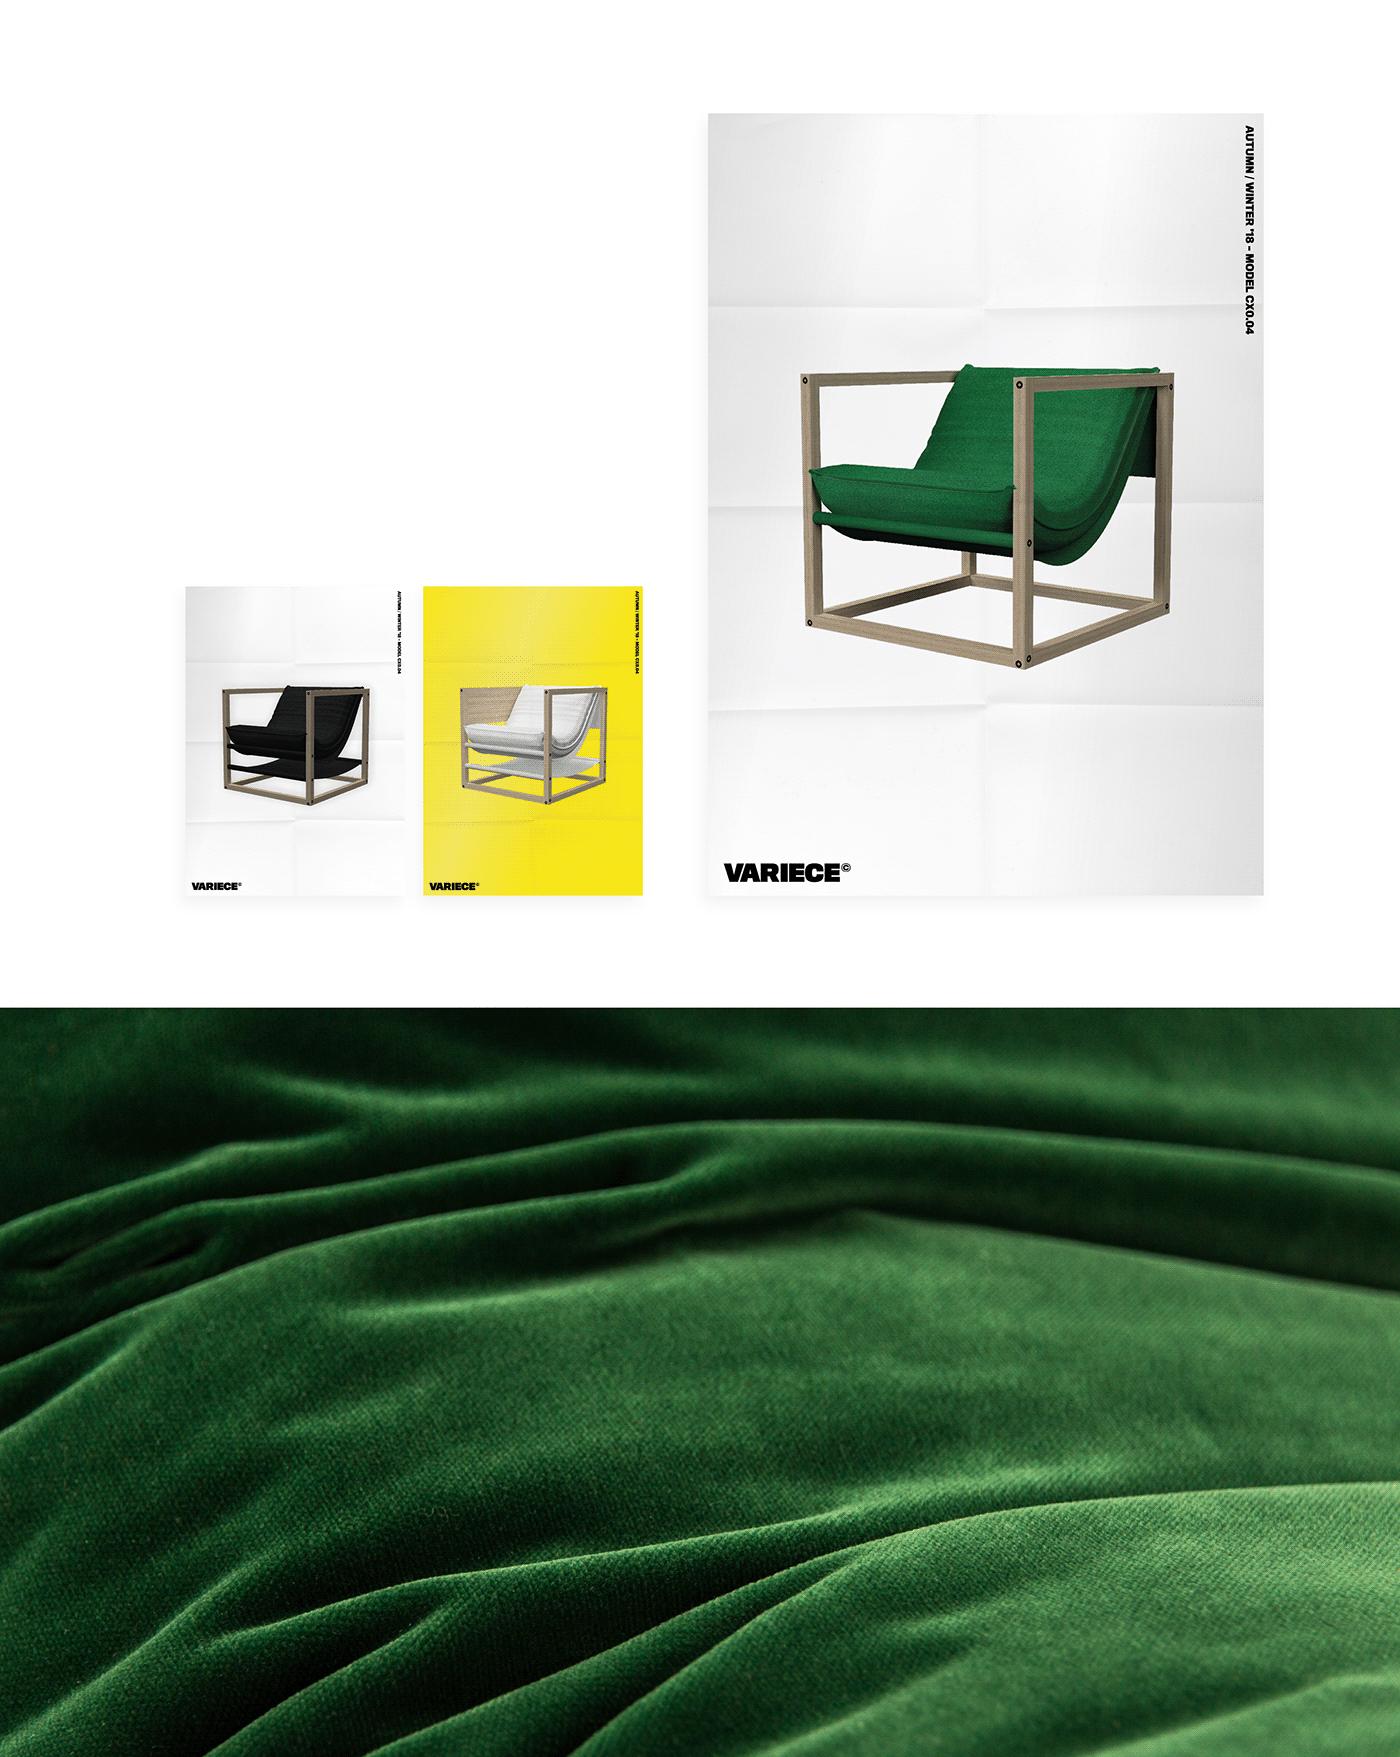 Corporate Design branding  product design  graphic design  furniture chair editorial design  Corporate Identity Photography  cinema 4d